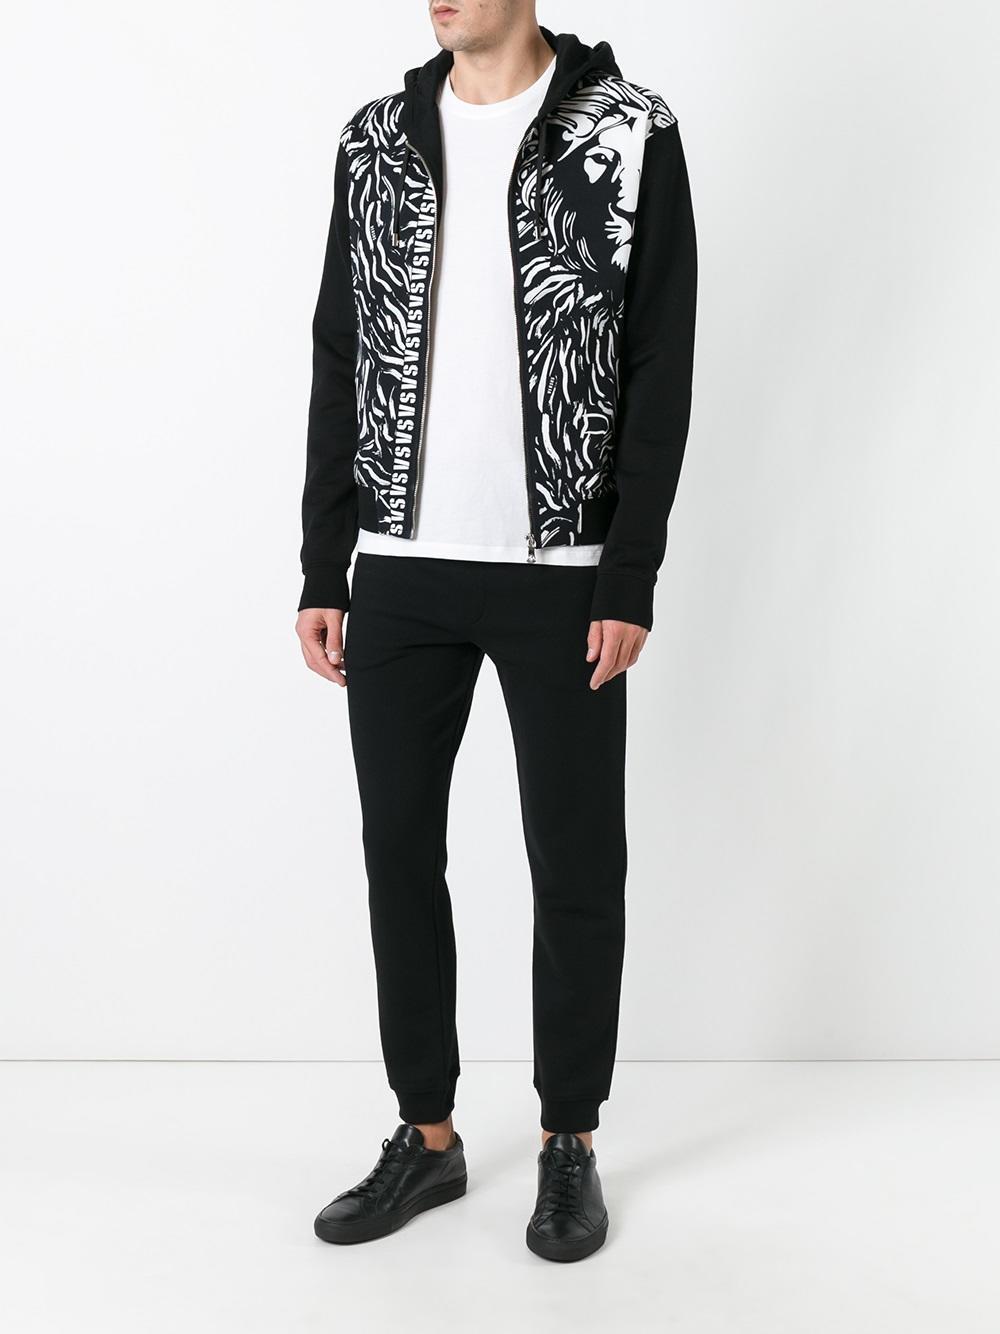 Versus Lion Print Hooded Cardigan in Black for Men | Lyst